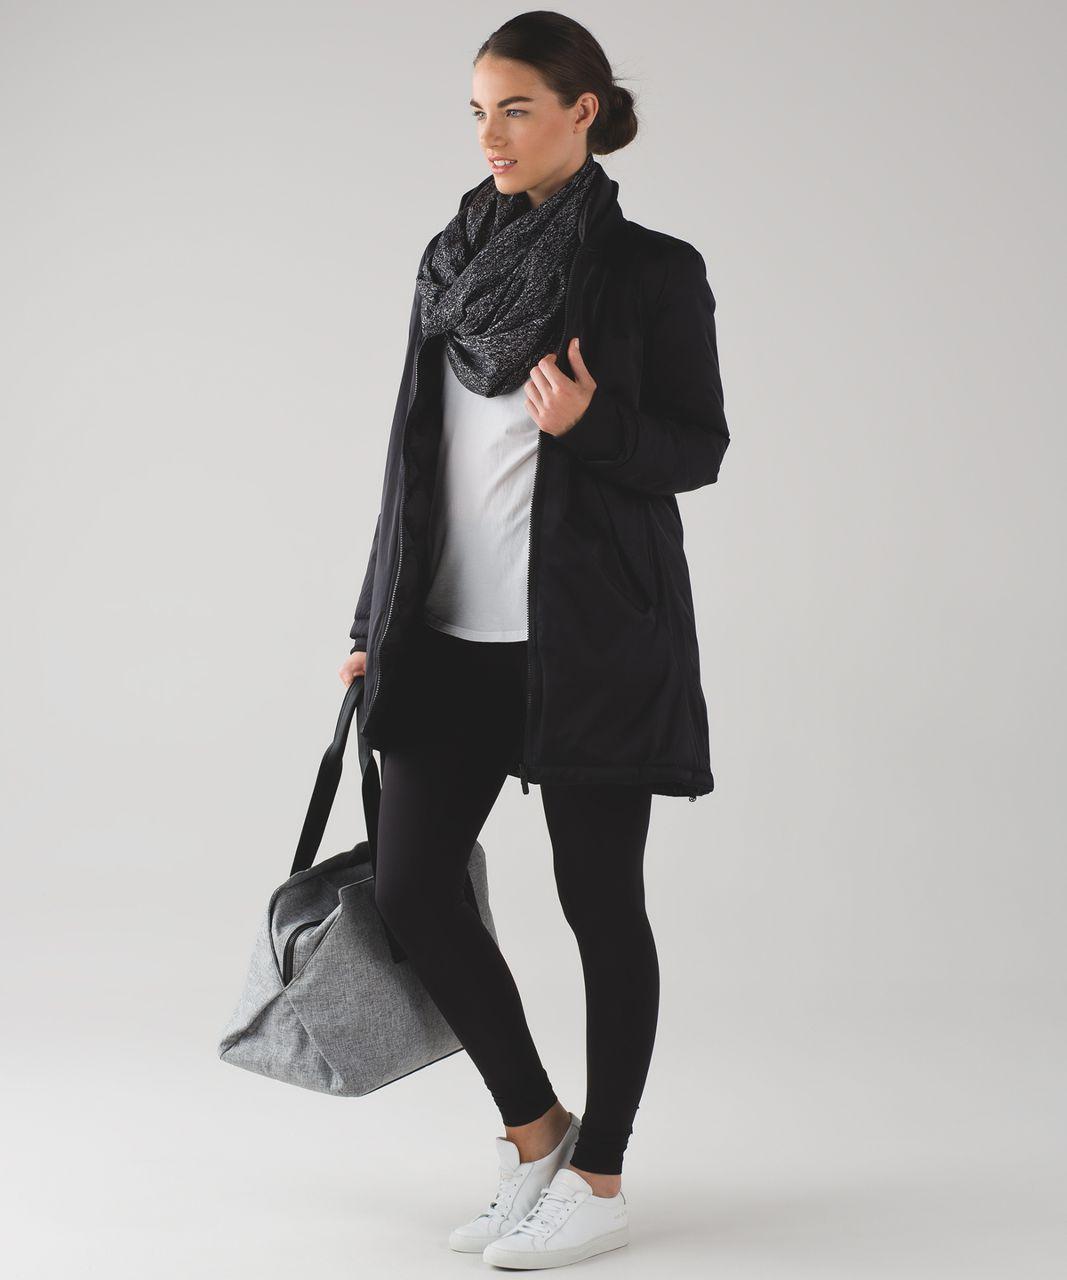 Lululemon Vinyasa Wrap - Running Luon Suited Jacquard Black White / Black